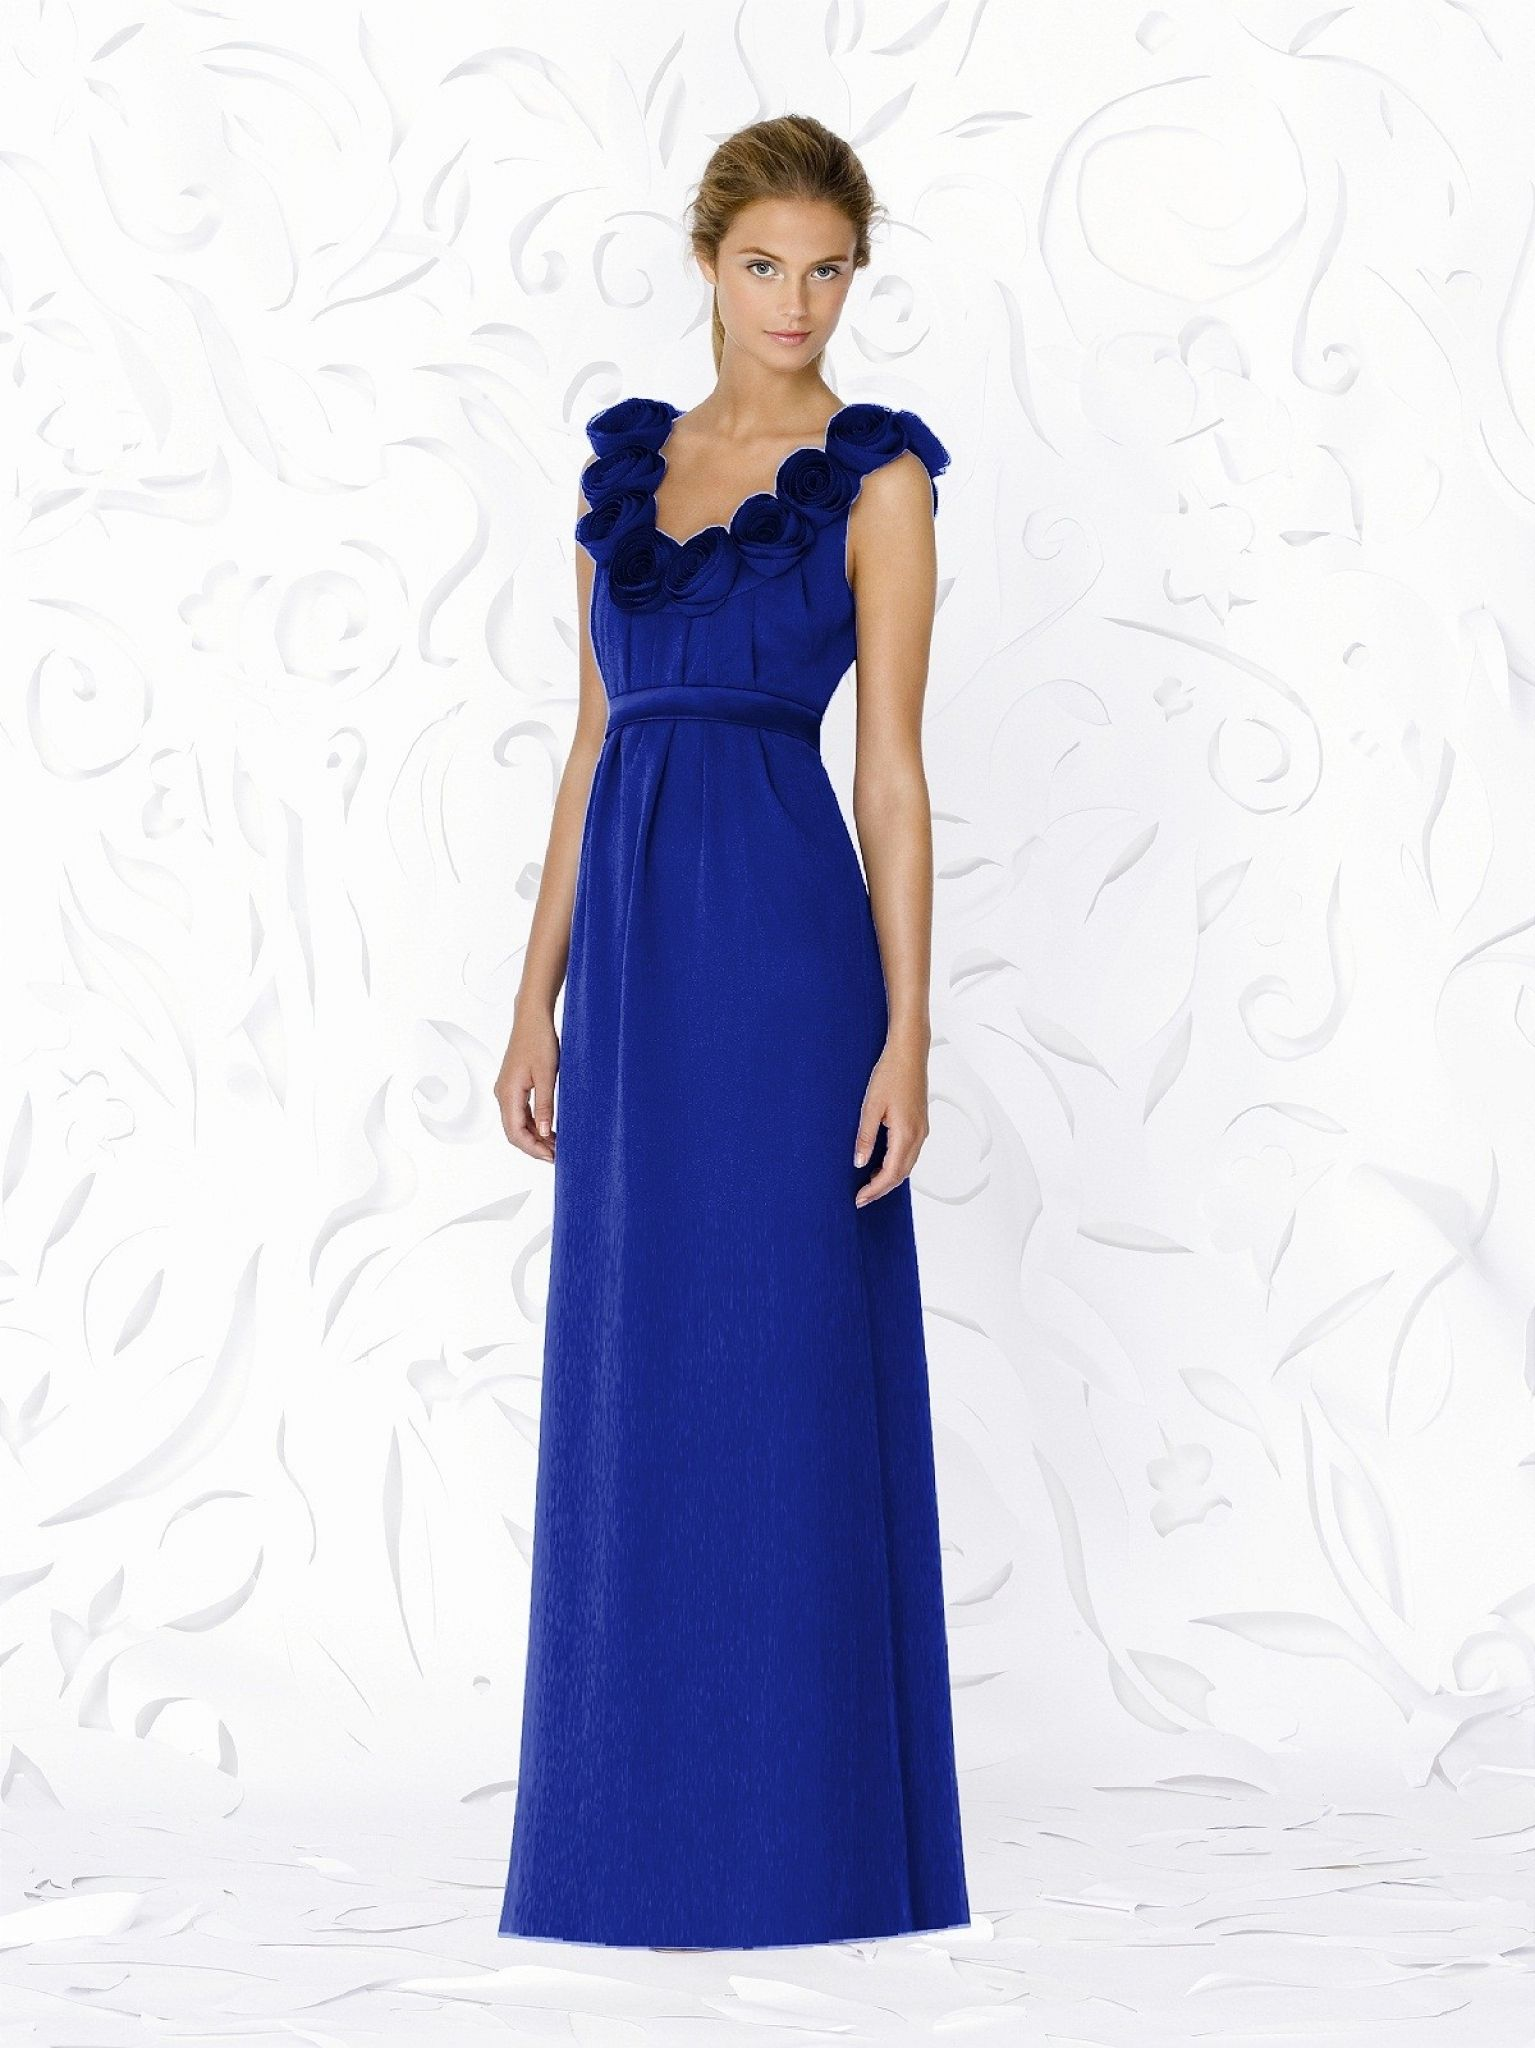 Simple blue wedding dresses wedding dresses for the mature bride simple blue wedding dresses wedding dresses for the mature bride check more at http ombrellifo Images